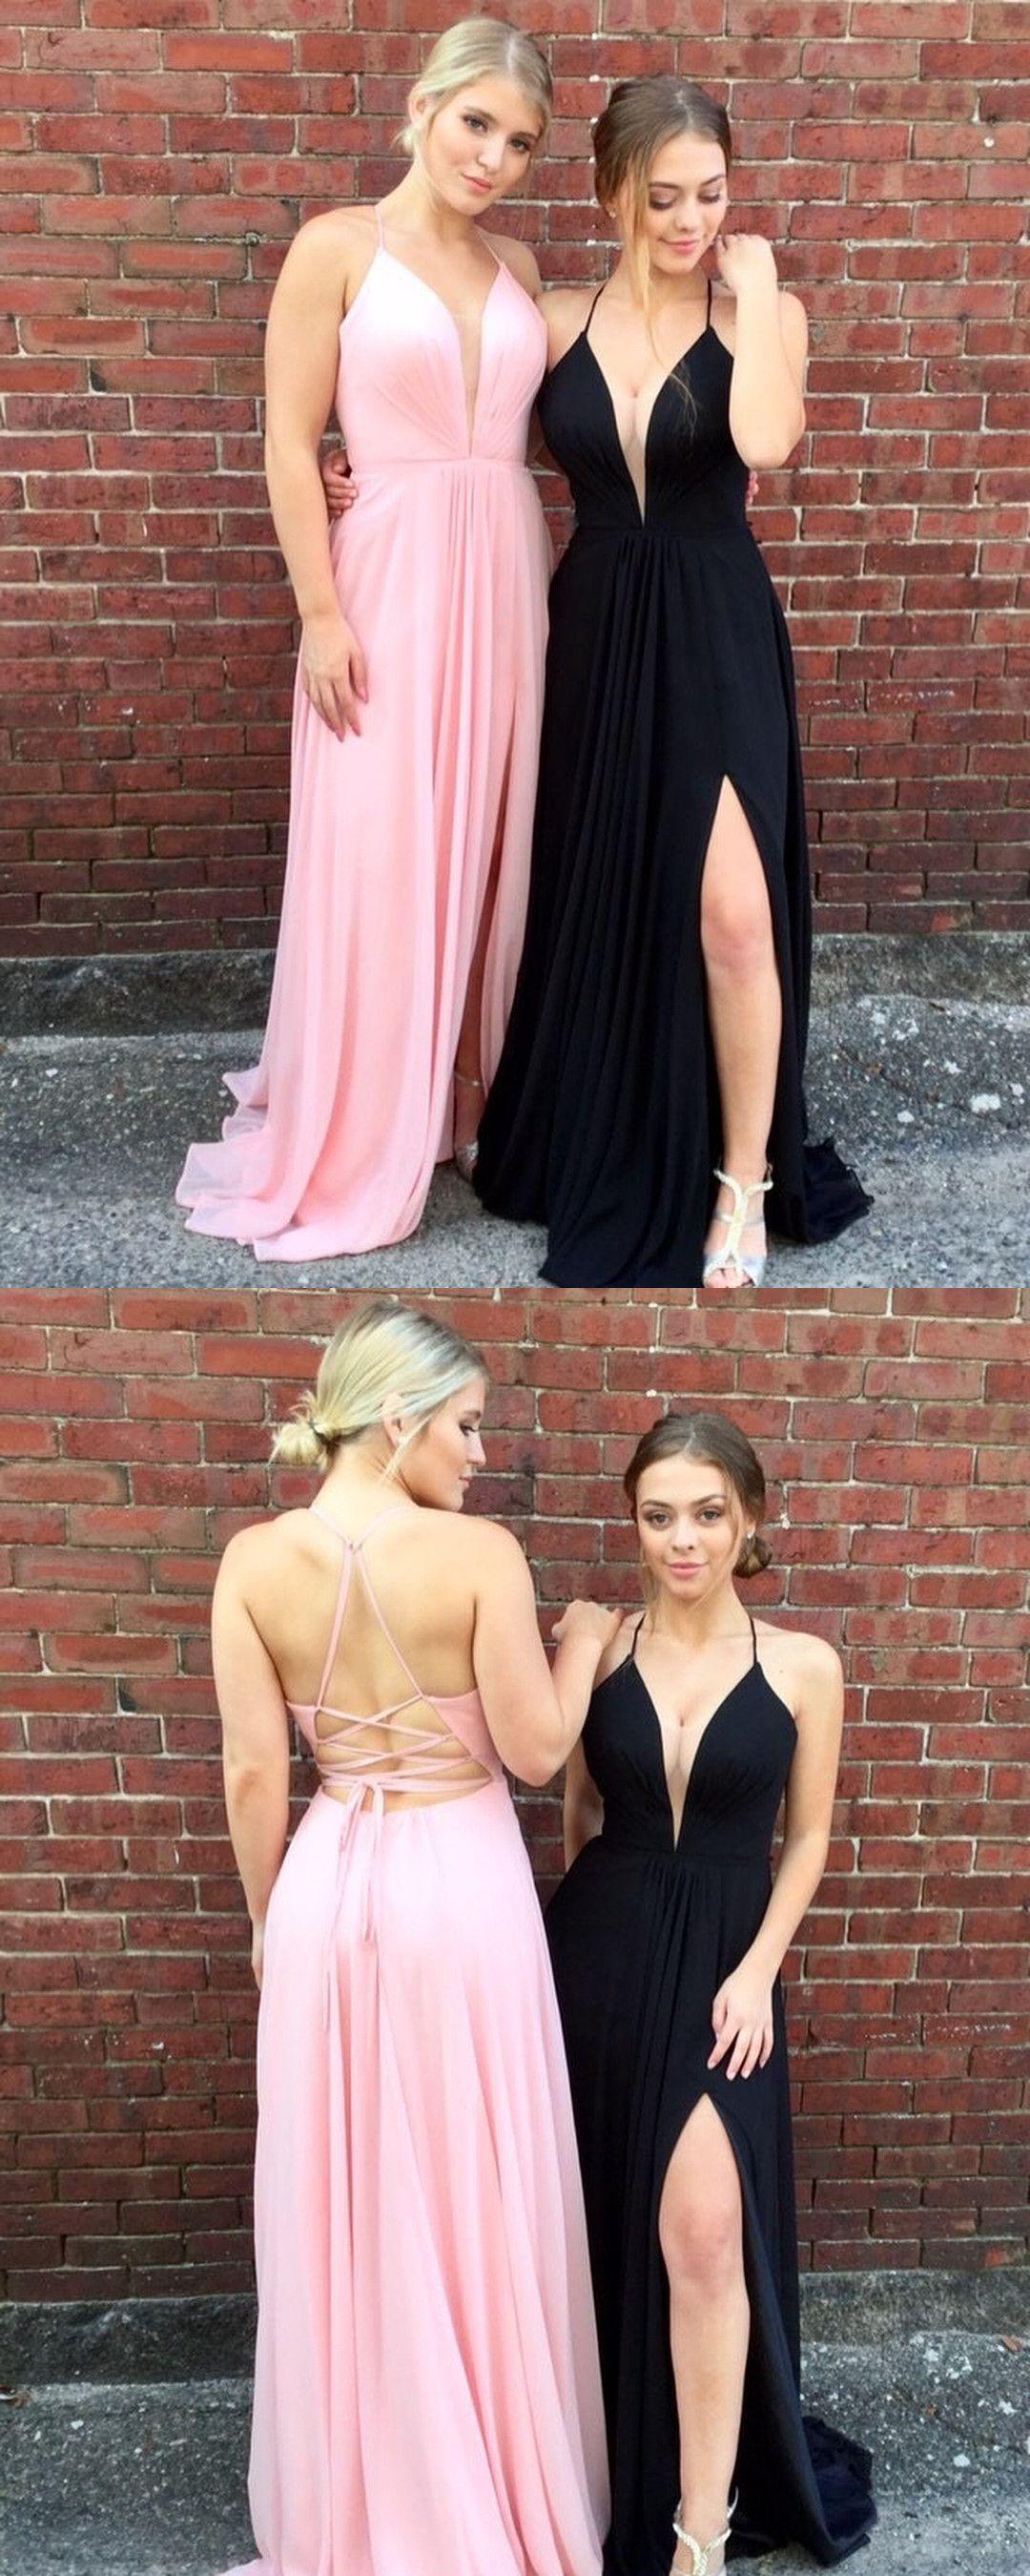 Halter burgundy long chiffon prom dress from dreamdressy slit prom